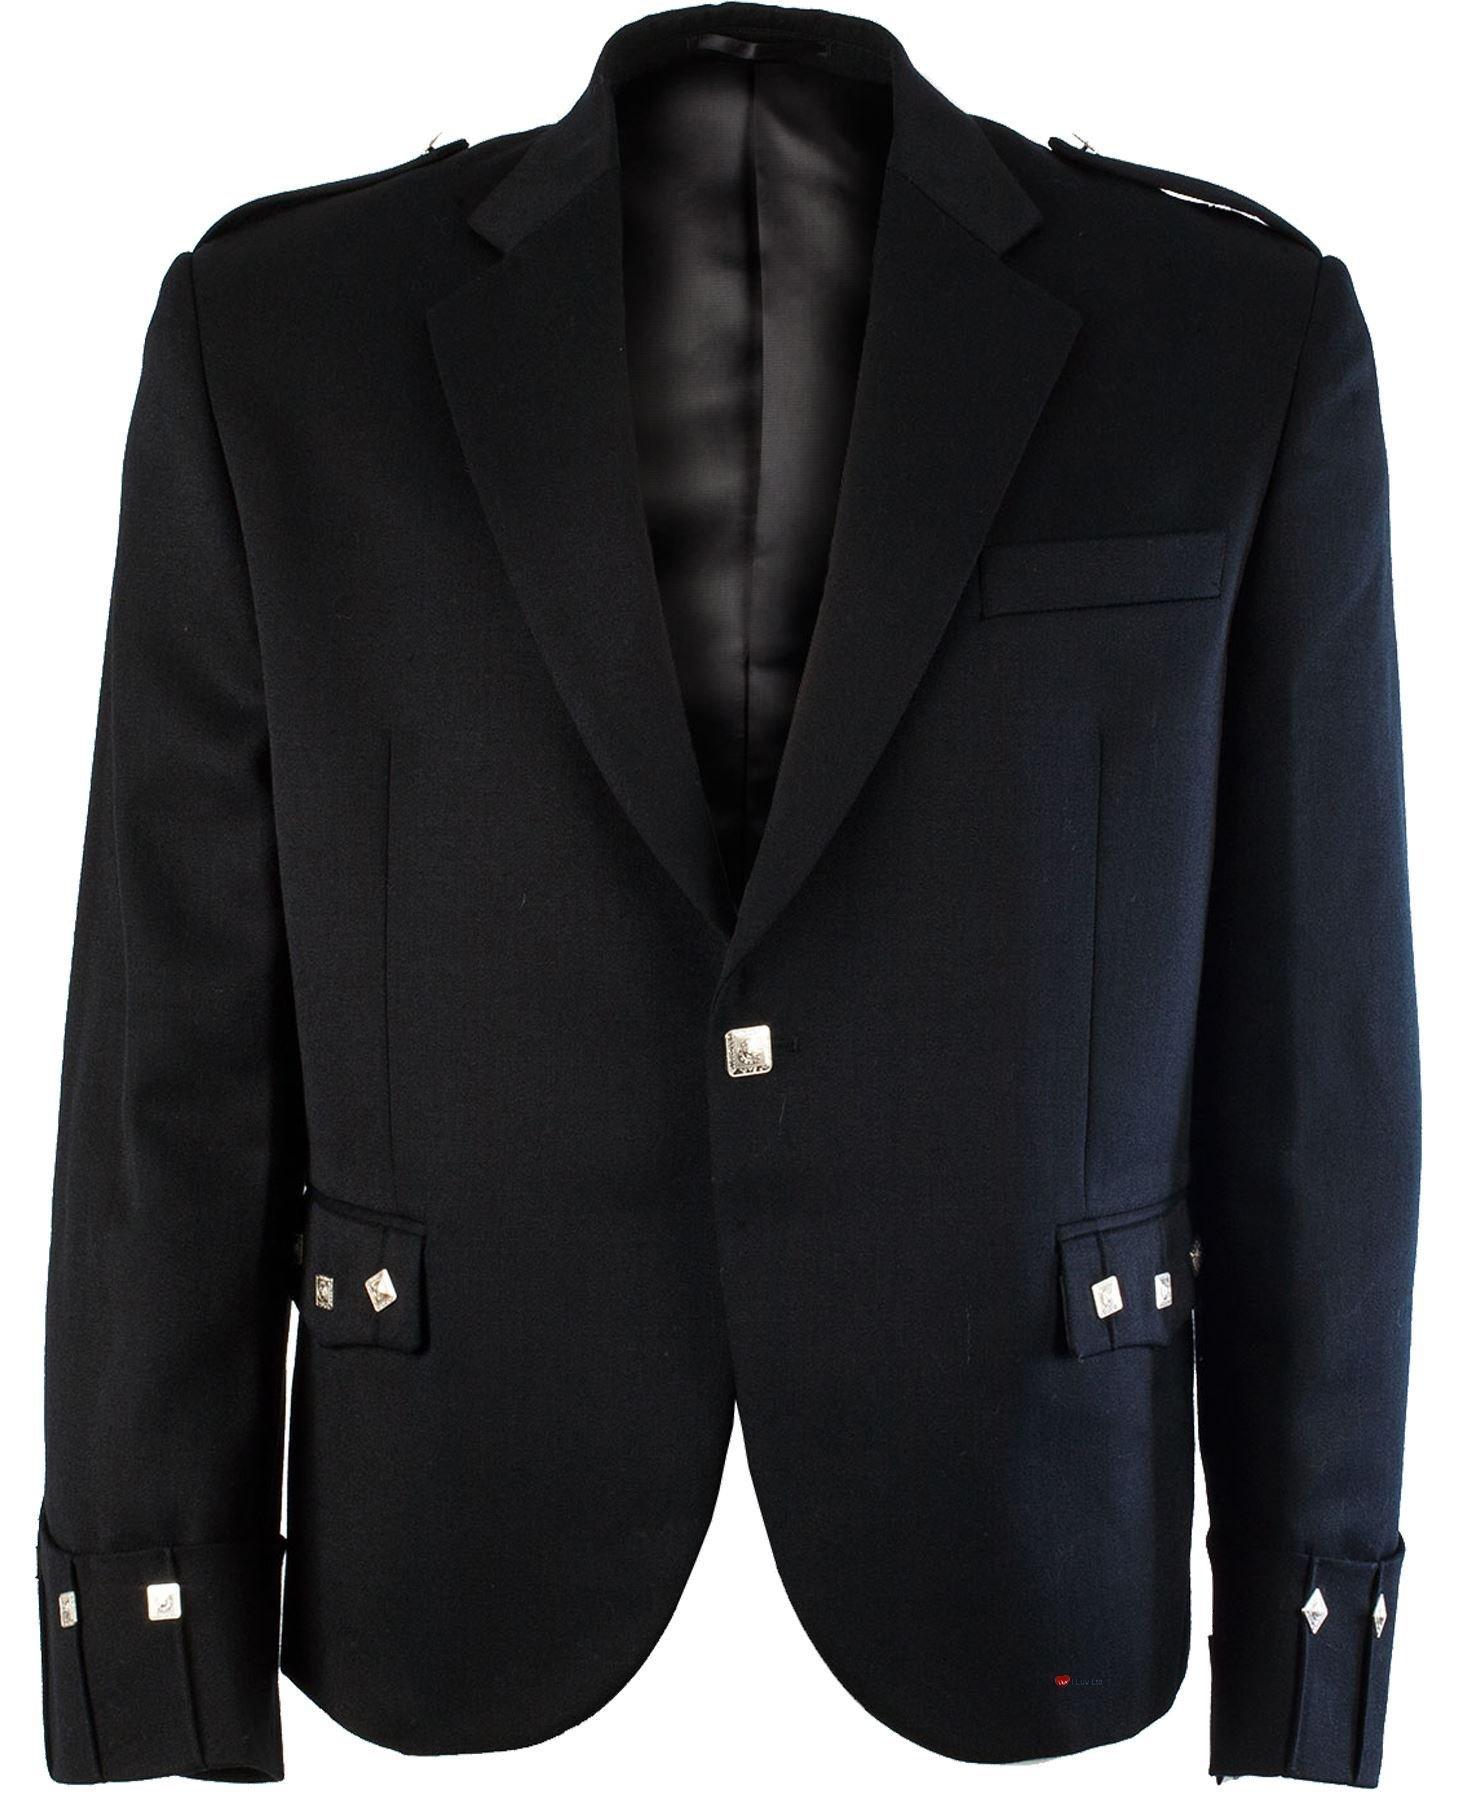 Argyll Kilt Jacket Comfortable Pure Barathea Wool Chrome Buttons Size 54inch - 137cm Short